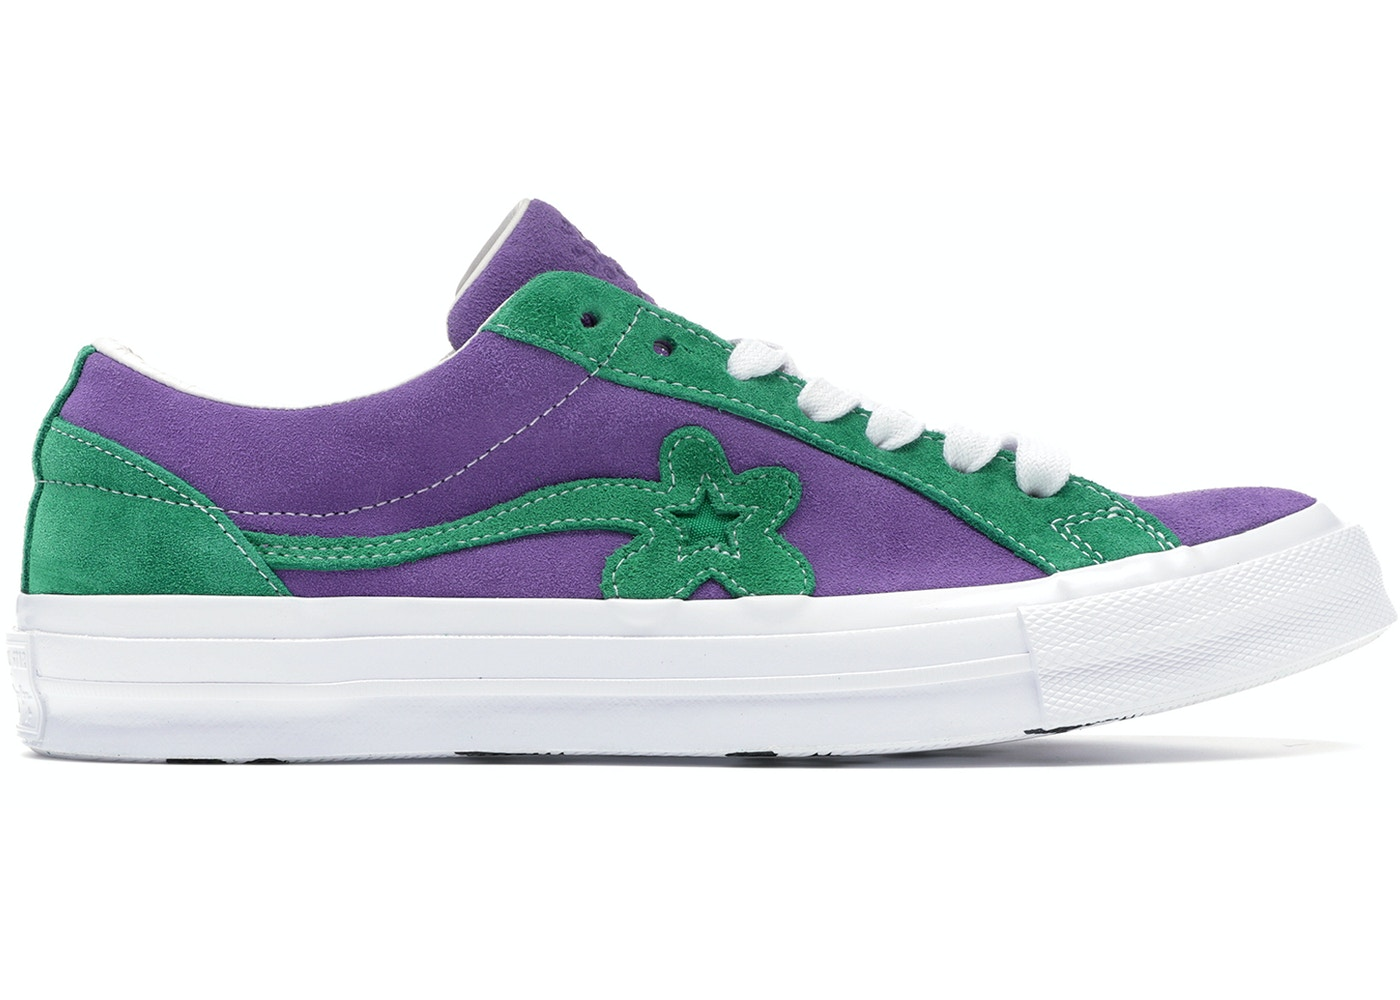 ed4d477a620 Converse One Star Ox Tyler the Creator Golf Le Fleur Purple Green - 162128C